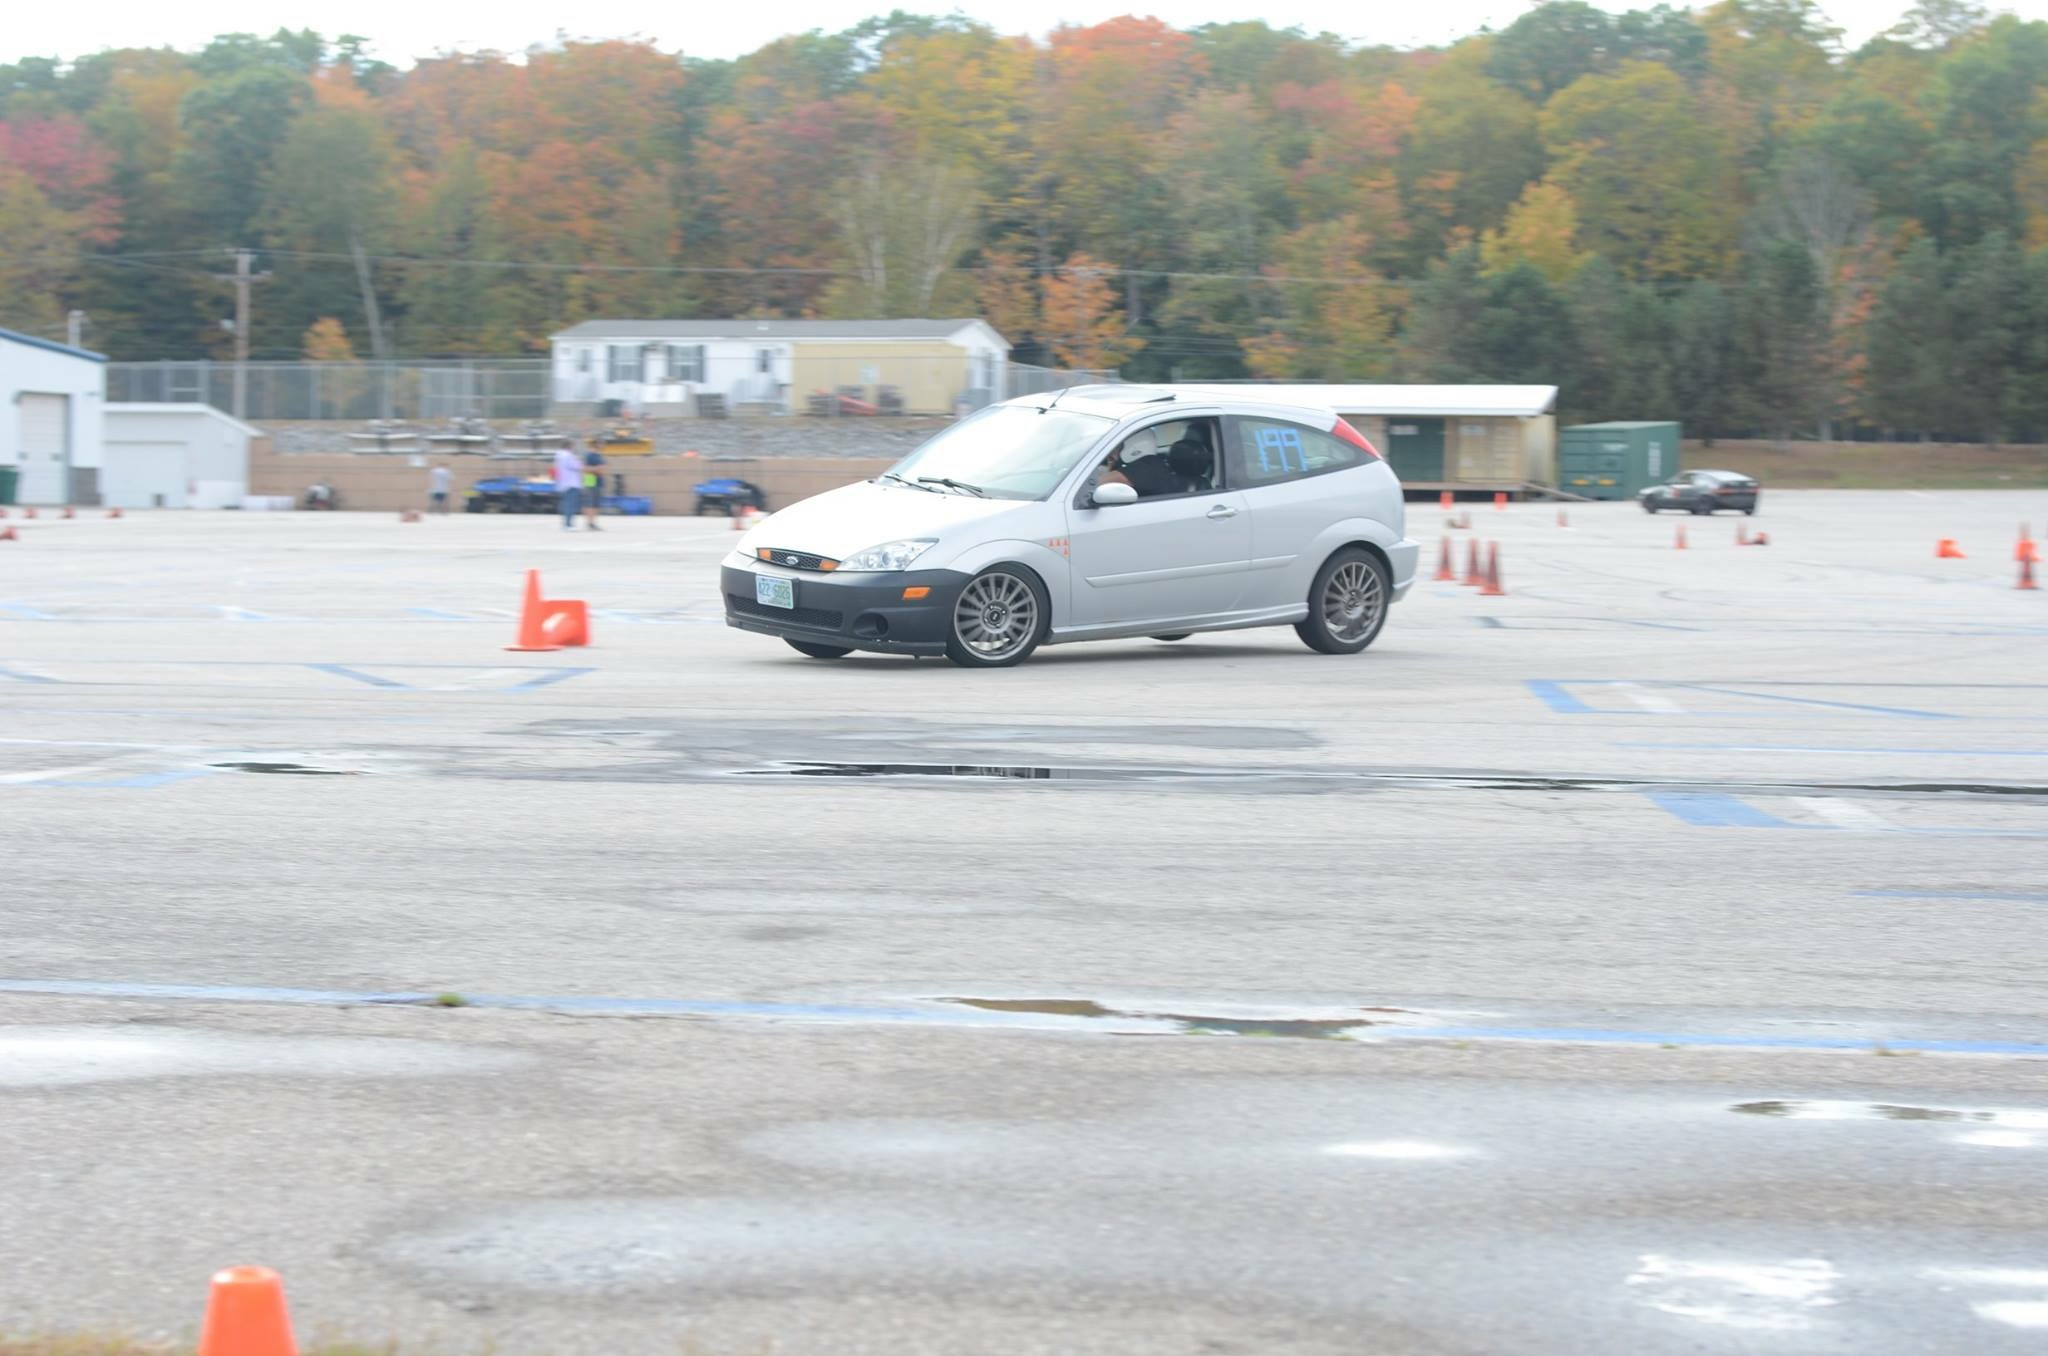 My 03 SVT HS class autox-r - Page 6 - Ford Focus Forum